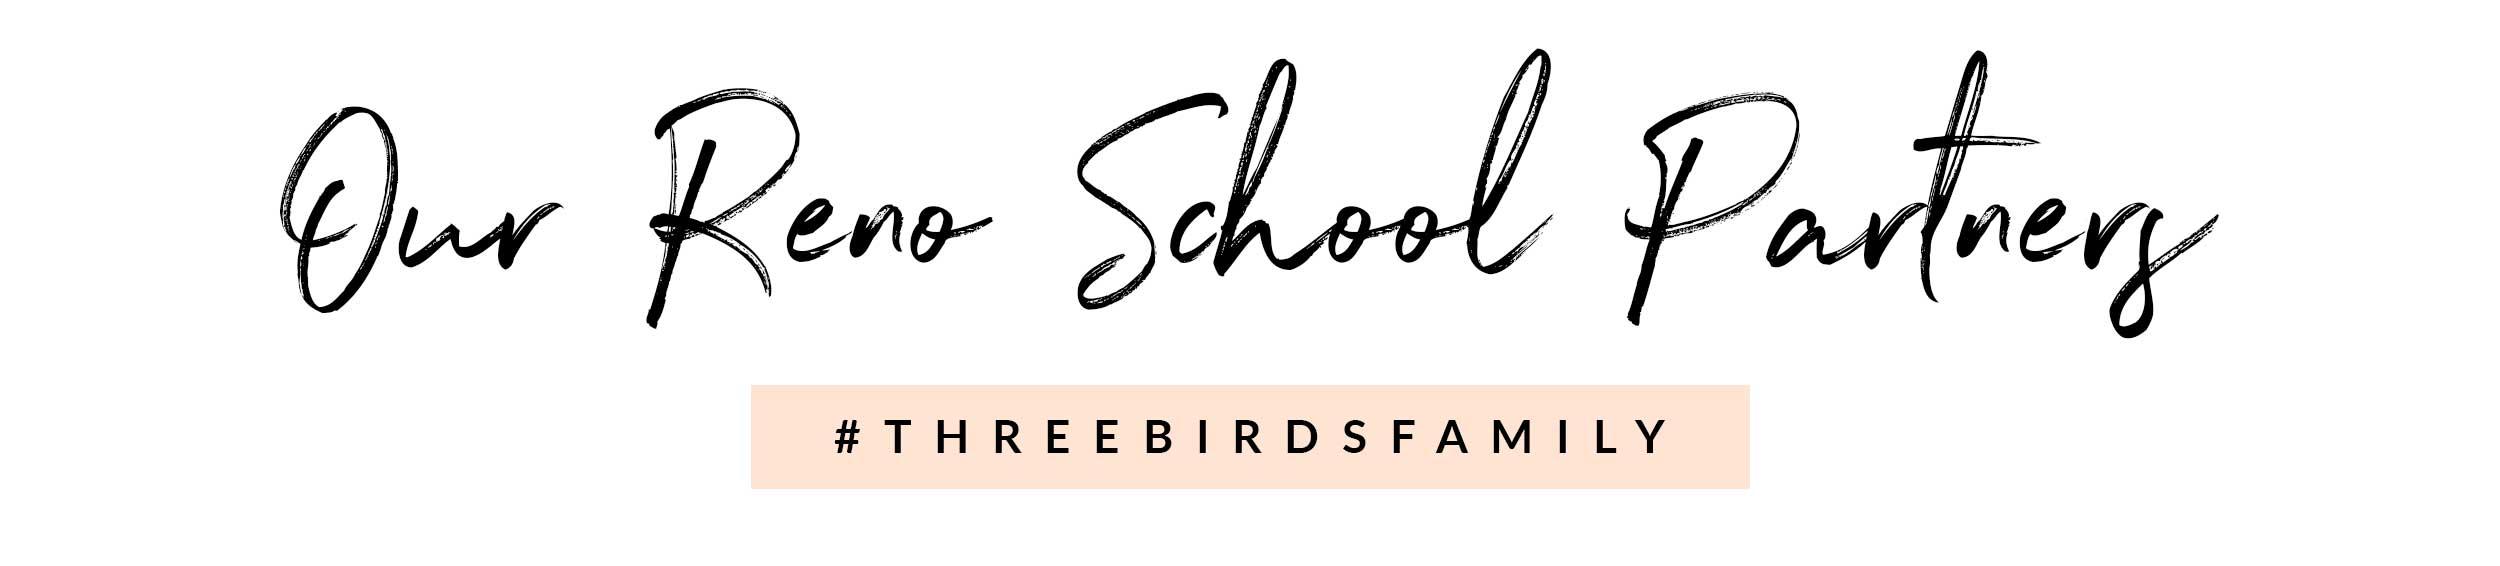 reno-school-family.jpg